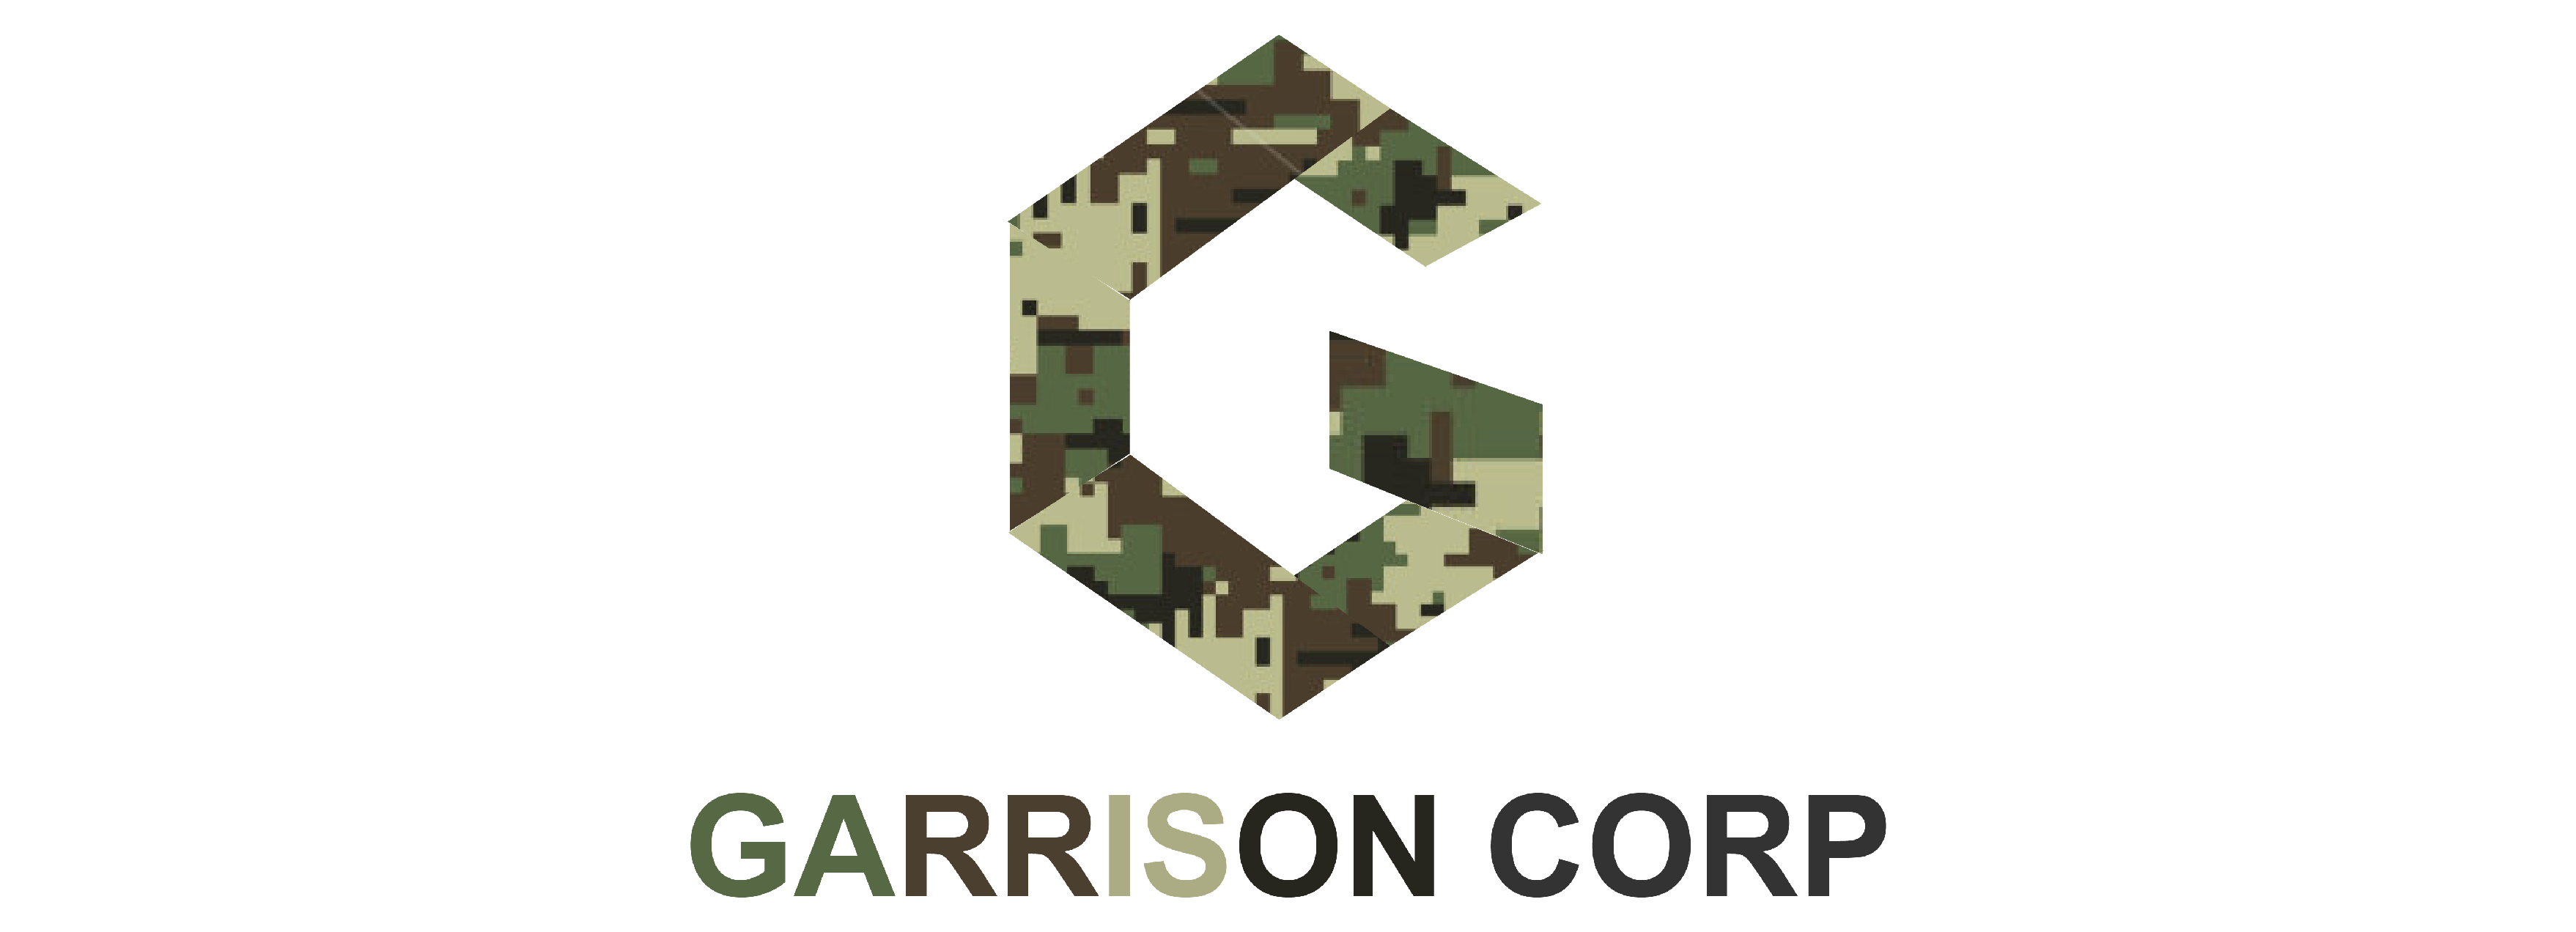 Garrisson Corps